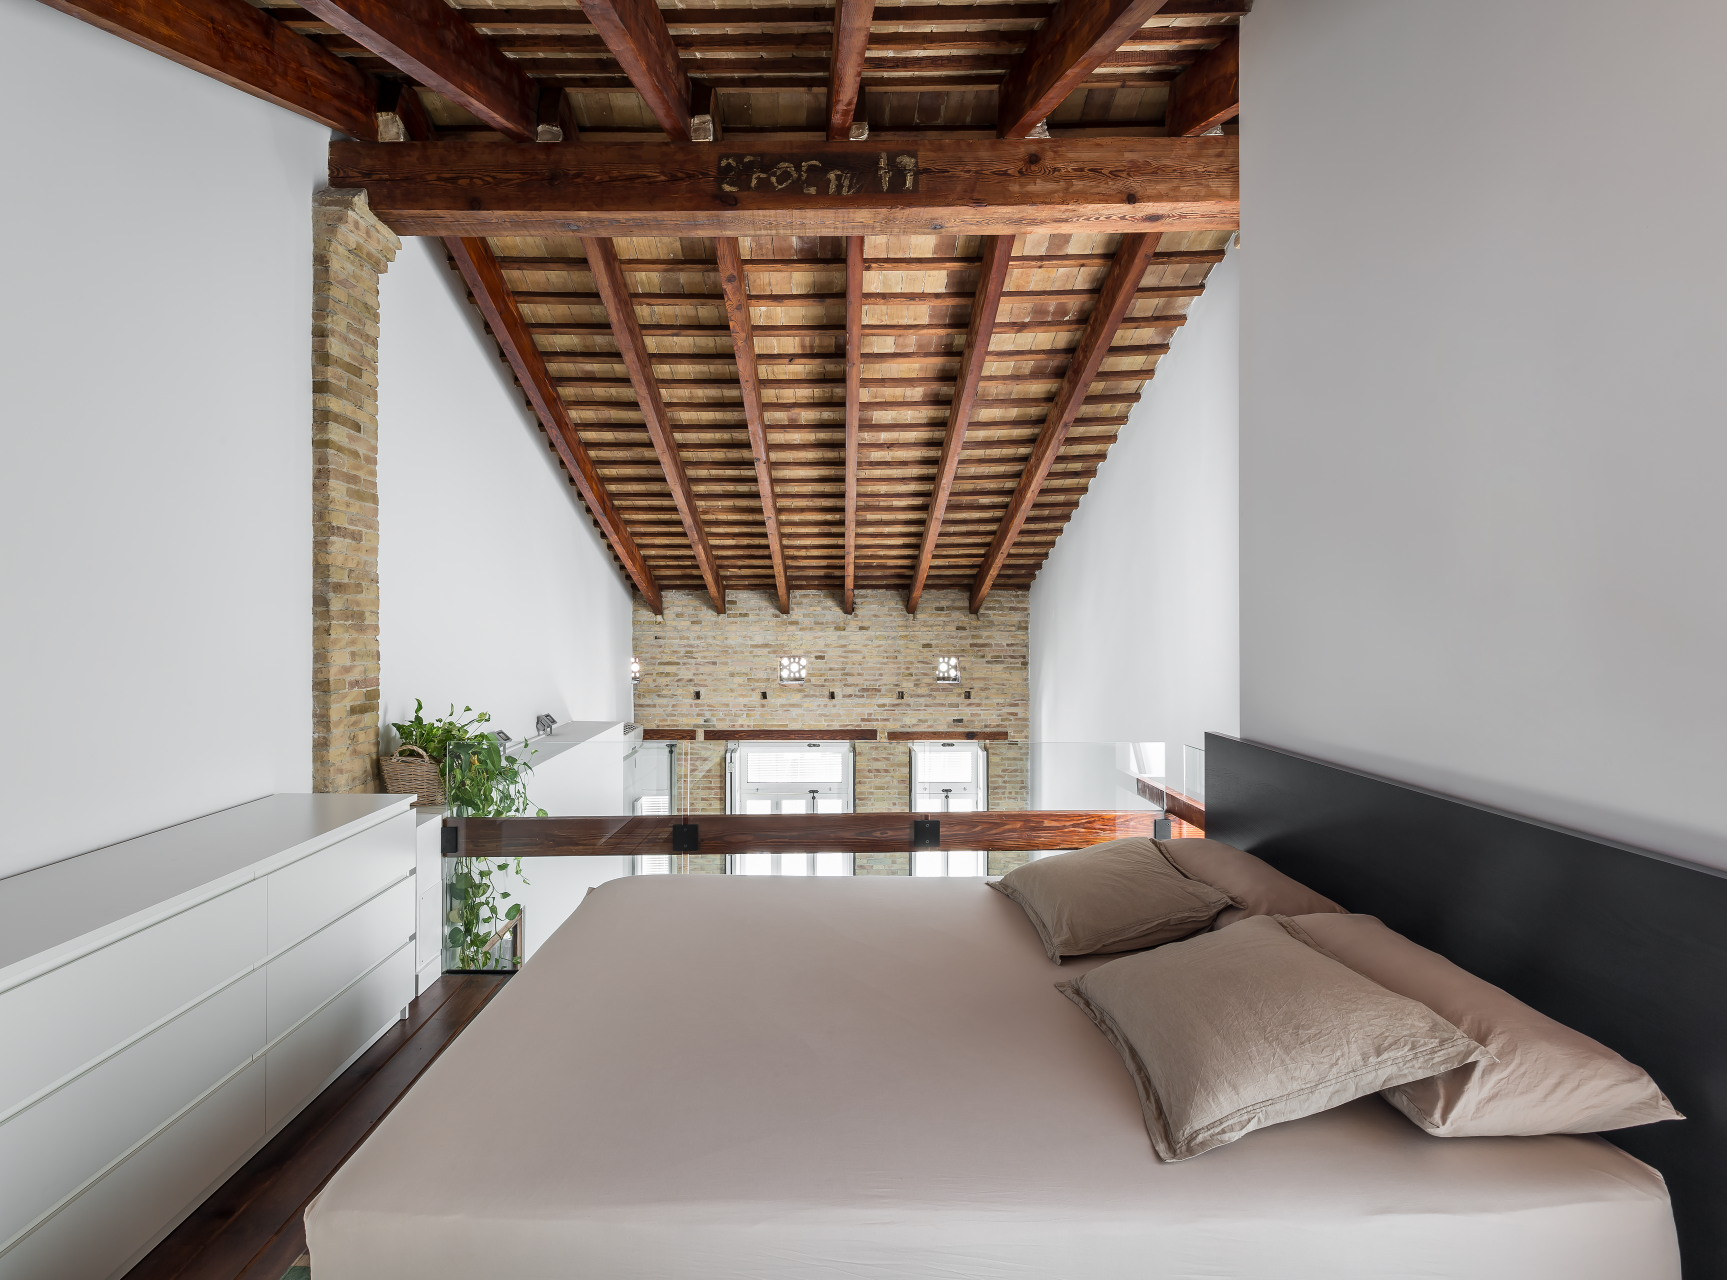 fotografia-arquitectura-valencia-german-cabo-ambau-cabanyal (22)